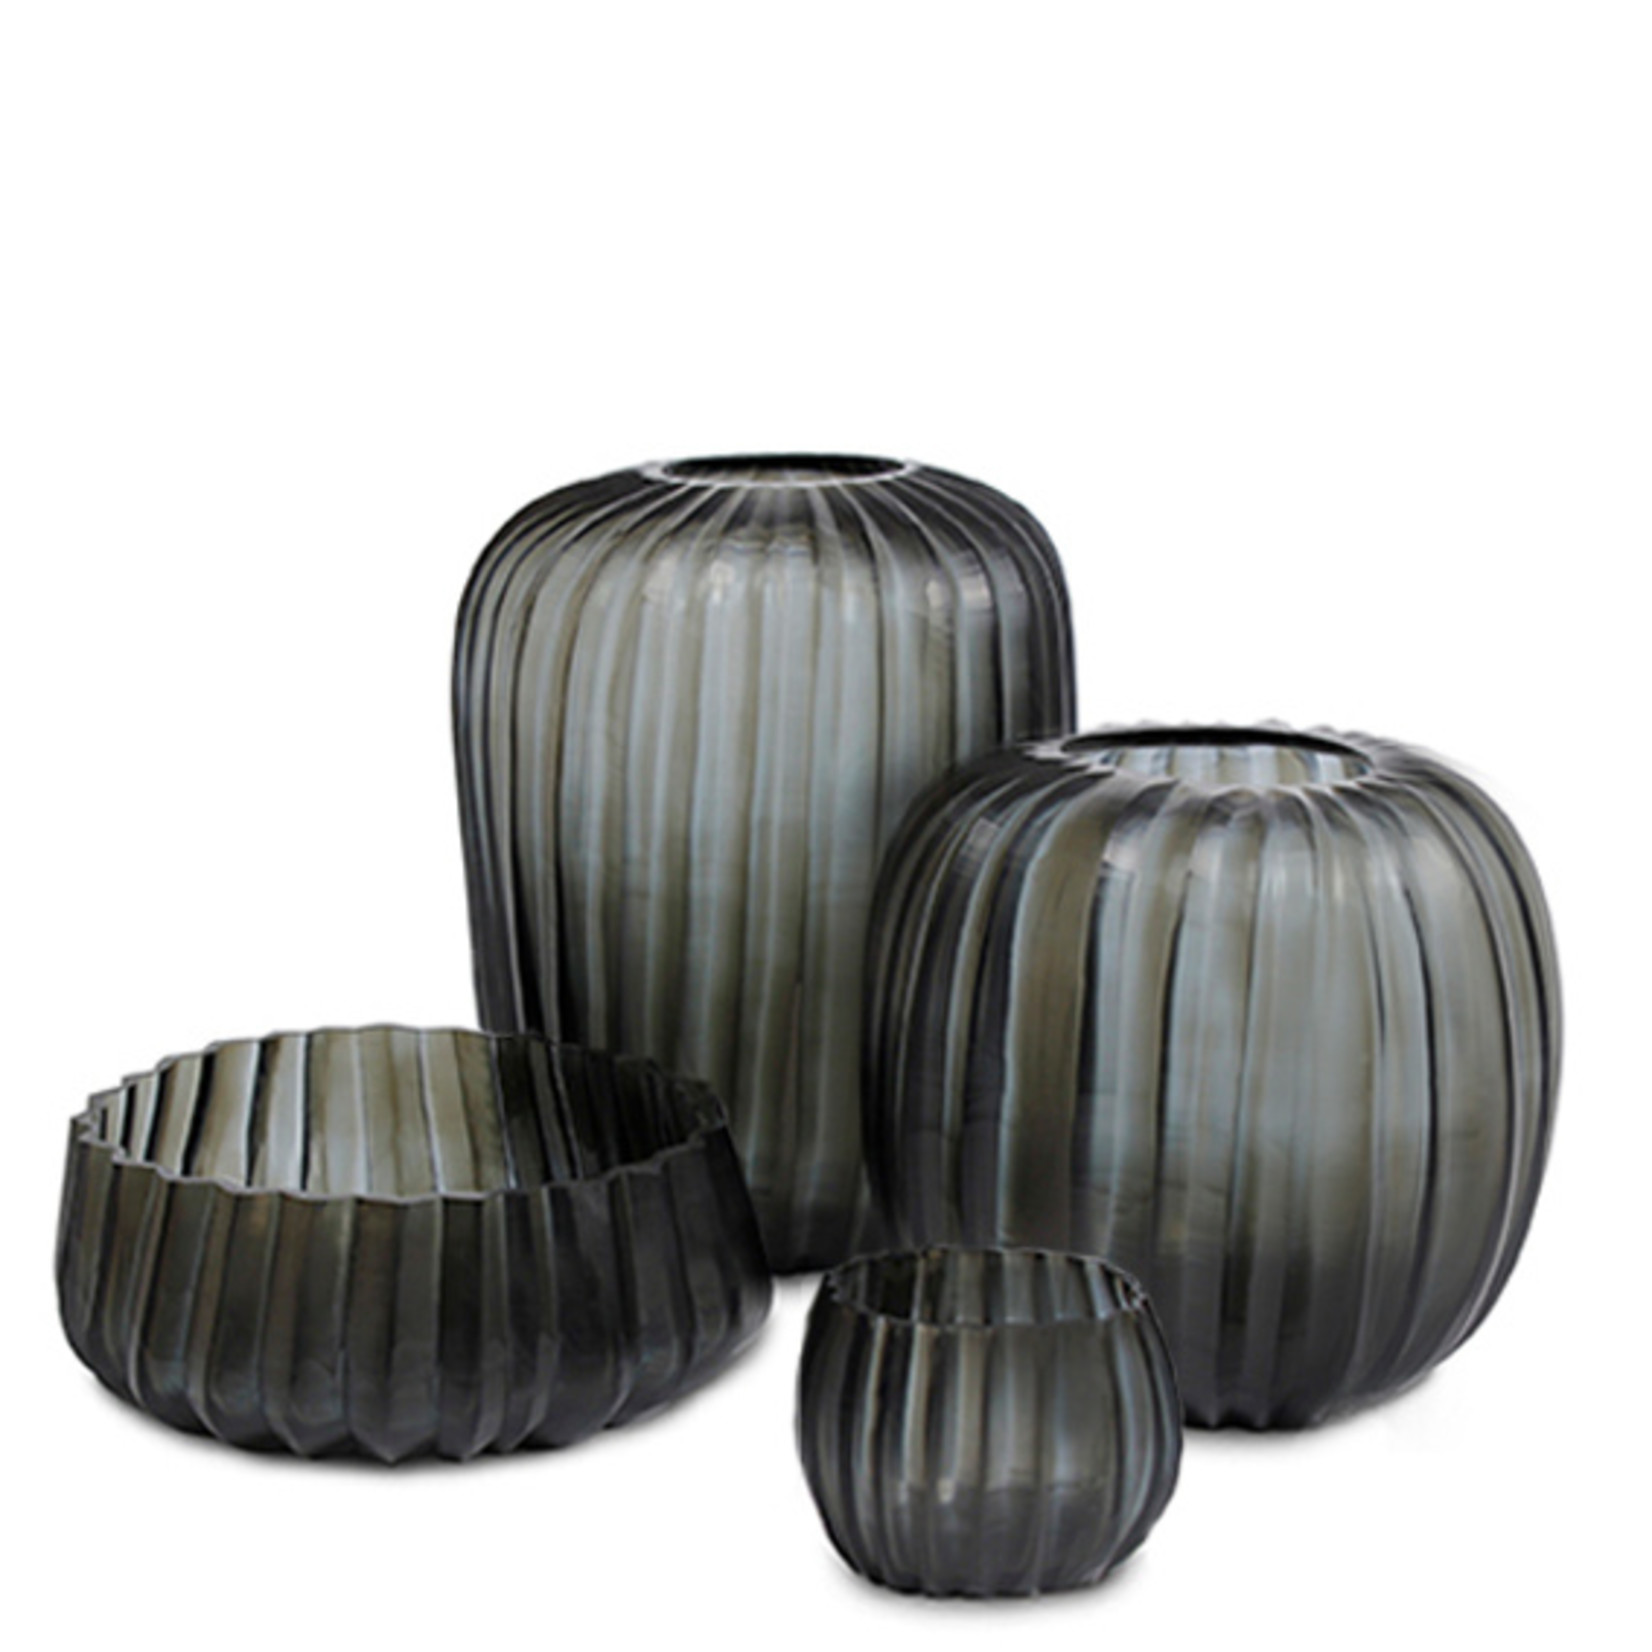 Guaxs Bowl Manakara | Indigo / Smoke Gray